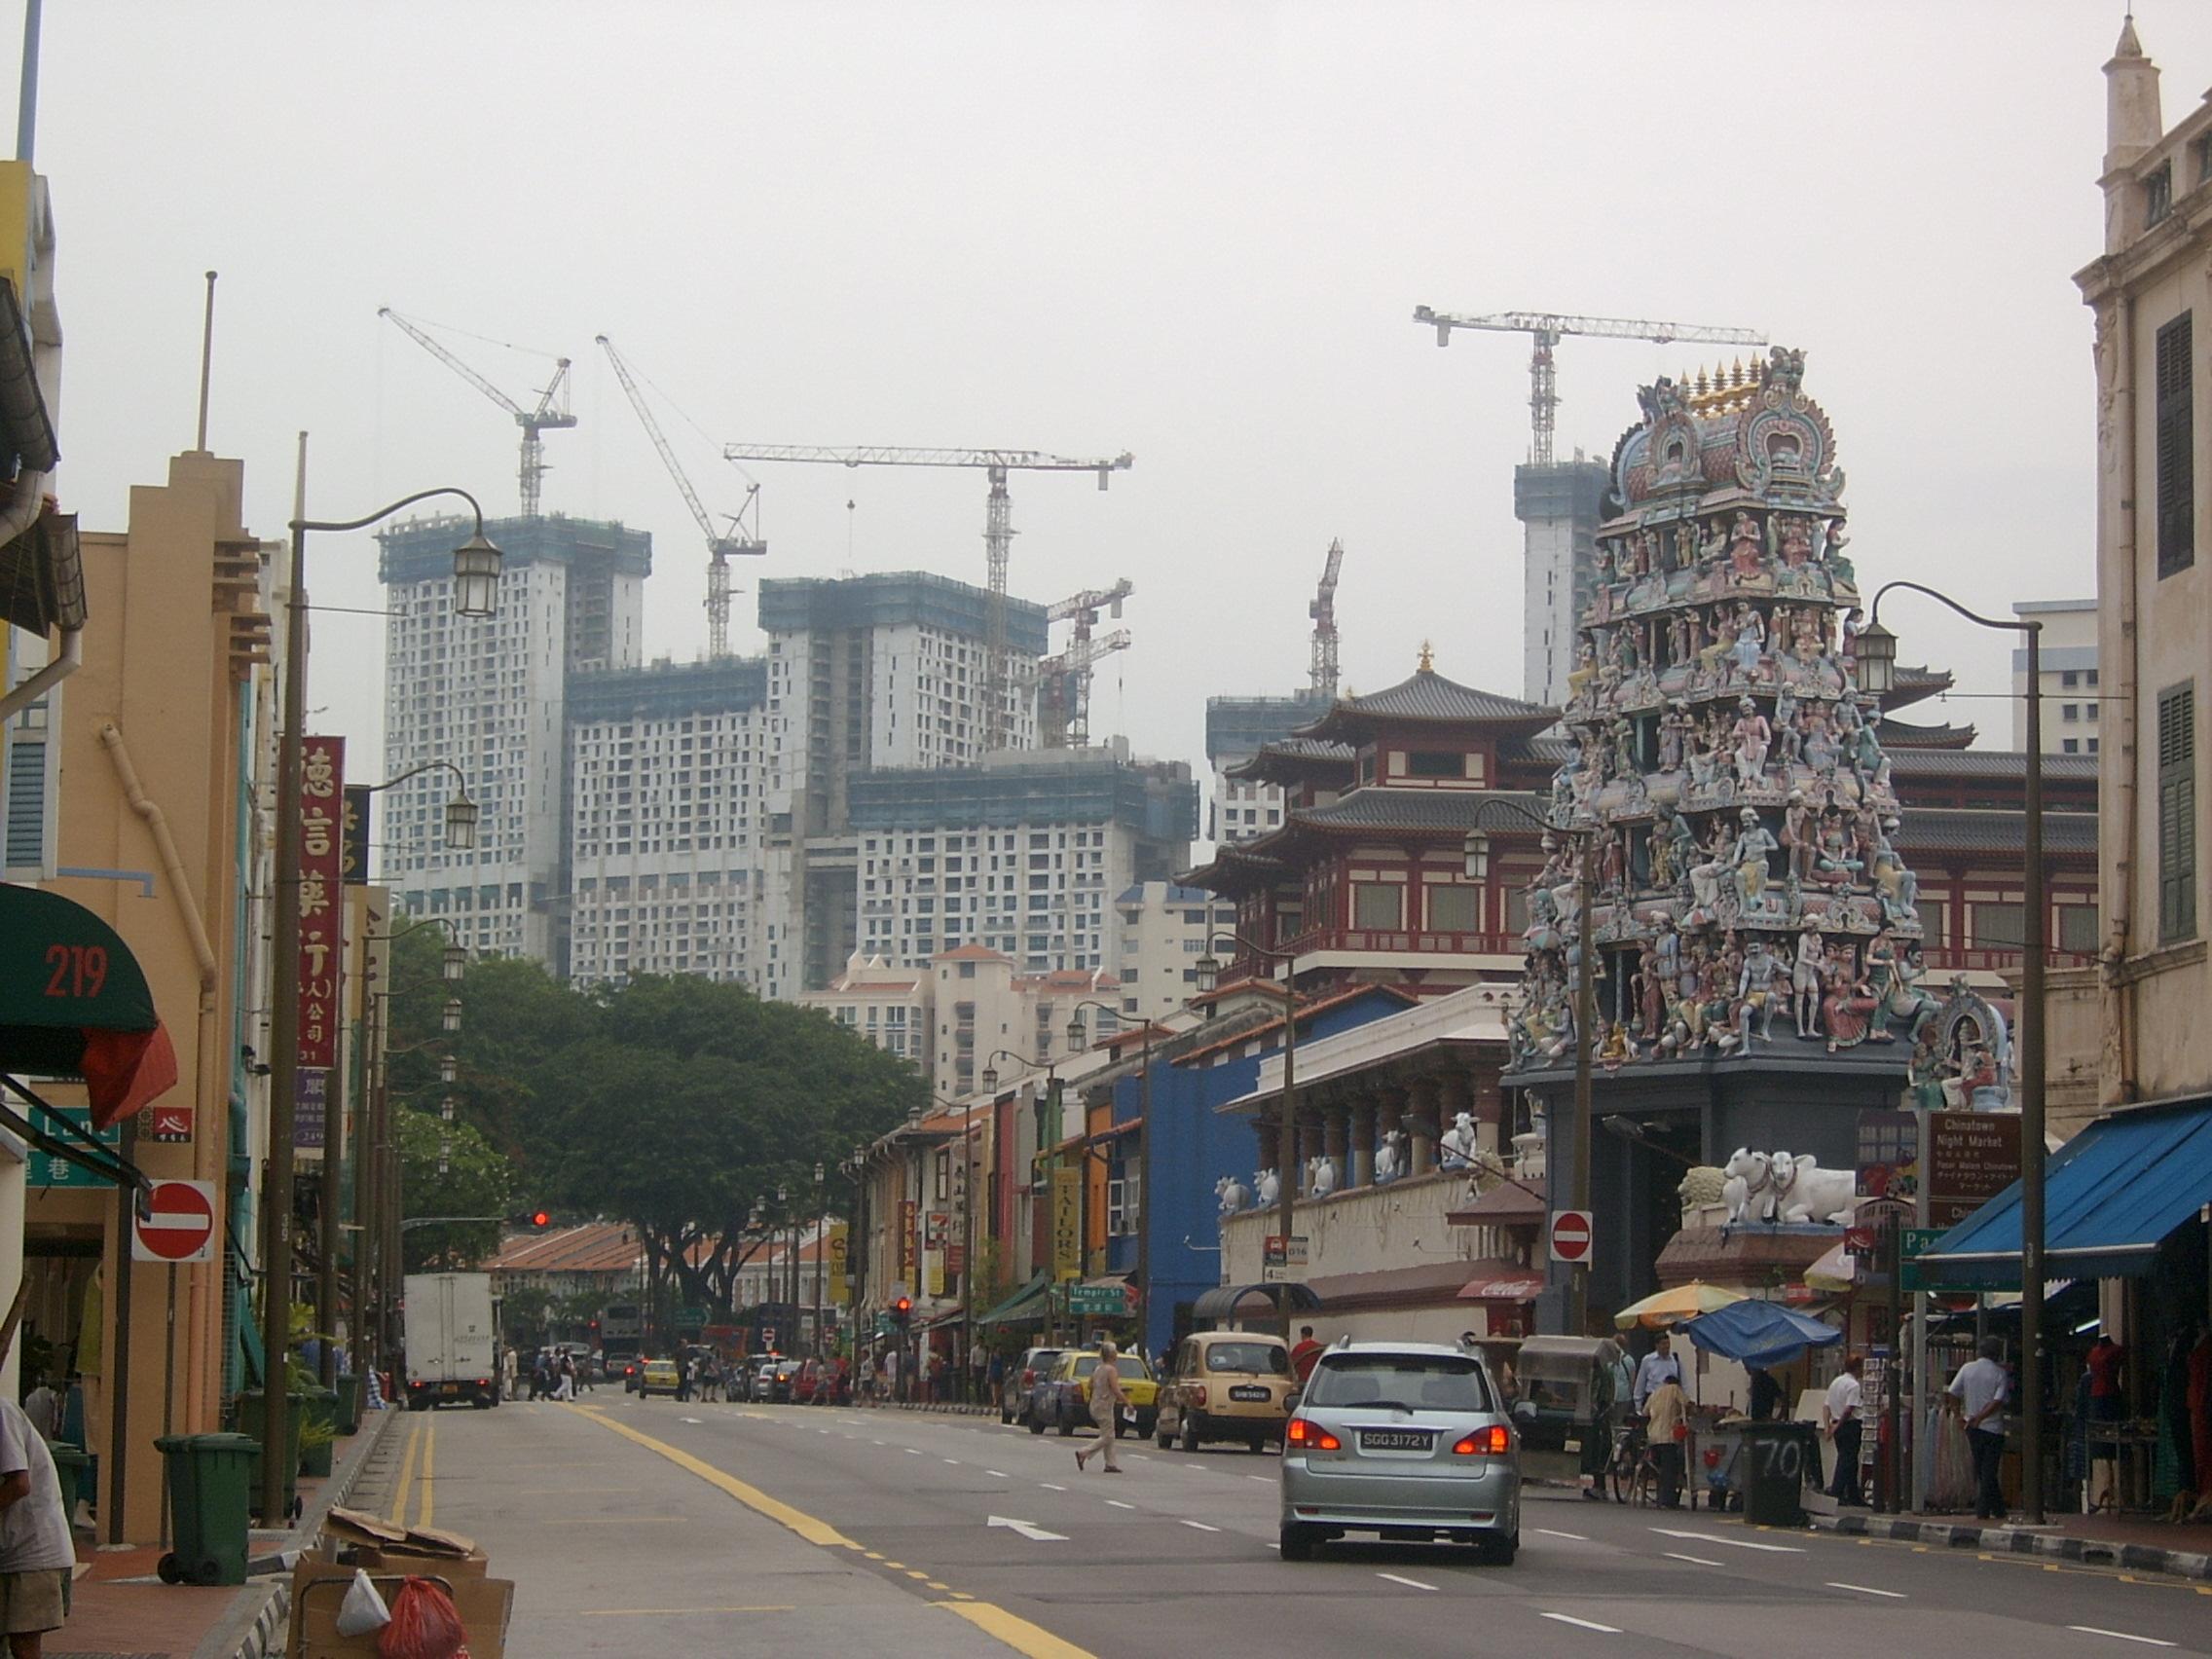 Filepinnacleduxton On South Bridge Road Singapore Jpg